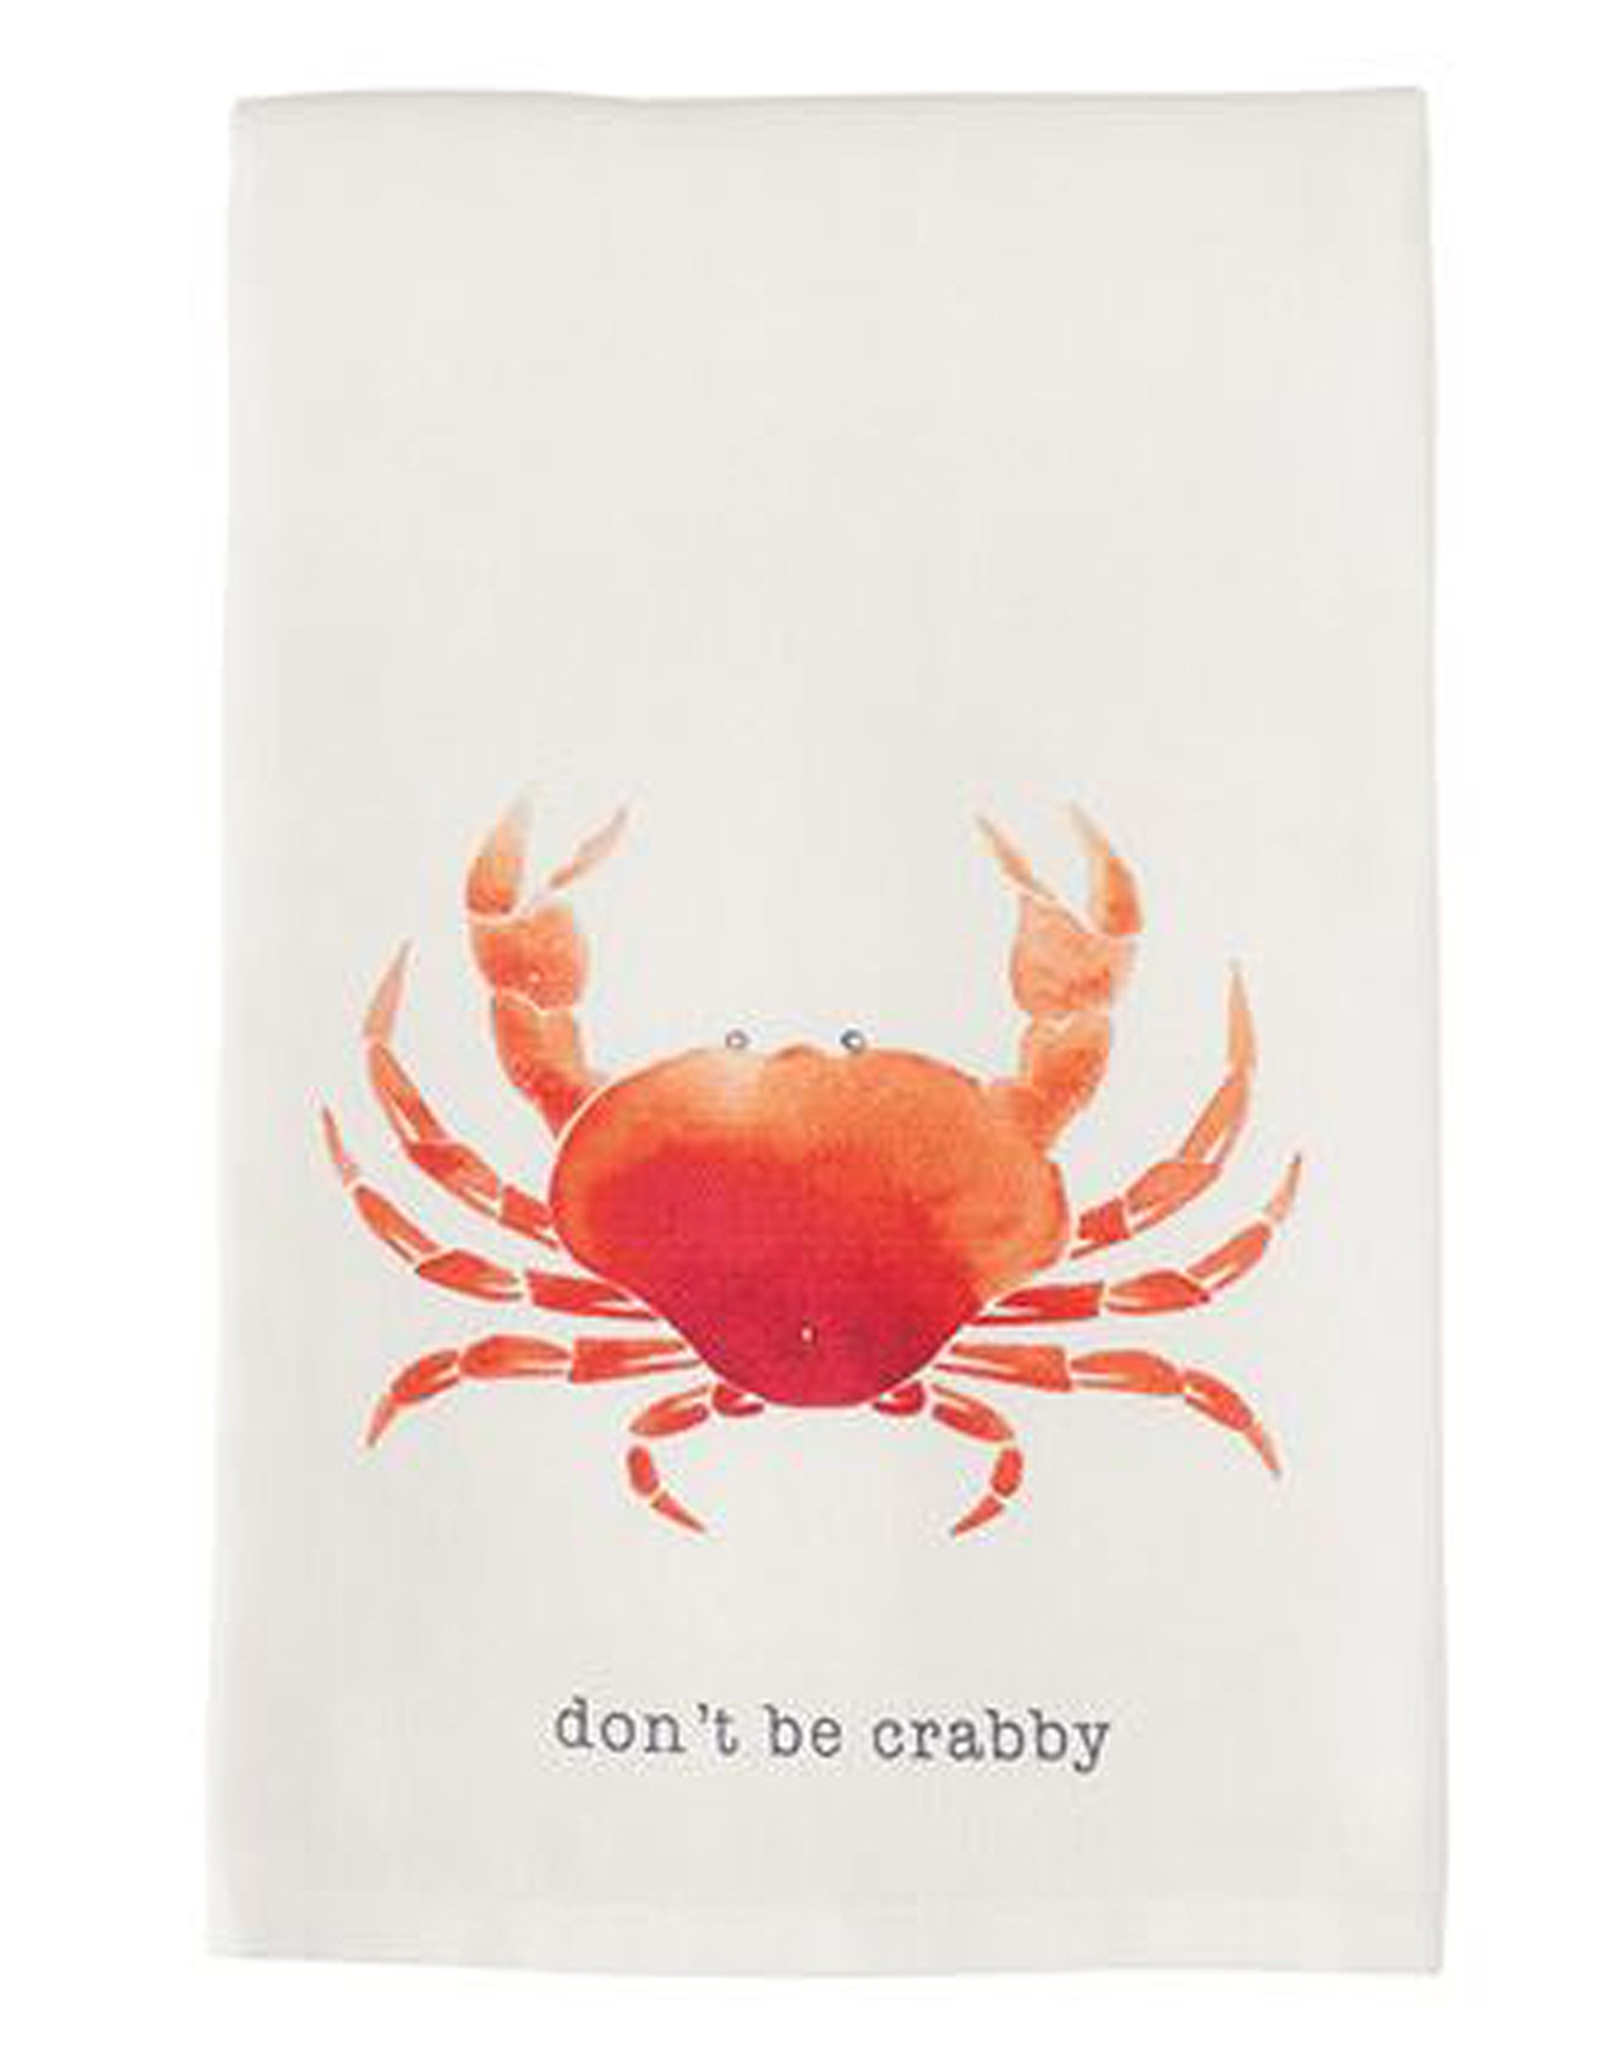 Mud Pie Beach House Nautical Dish Towel w Crab - Dont Be Crabby